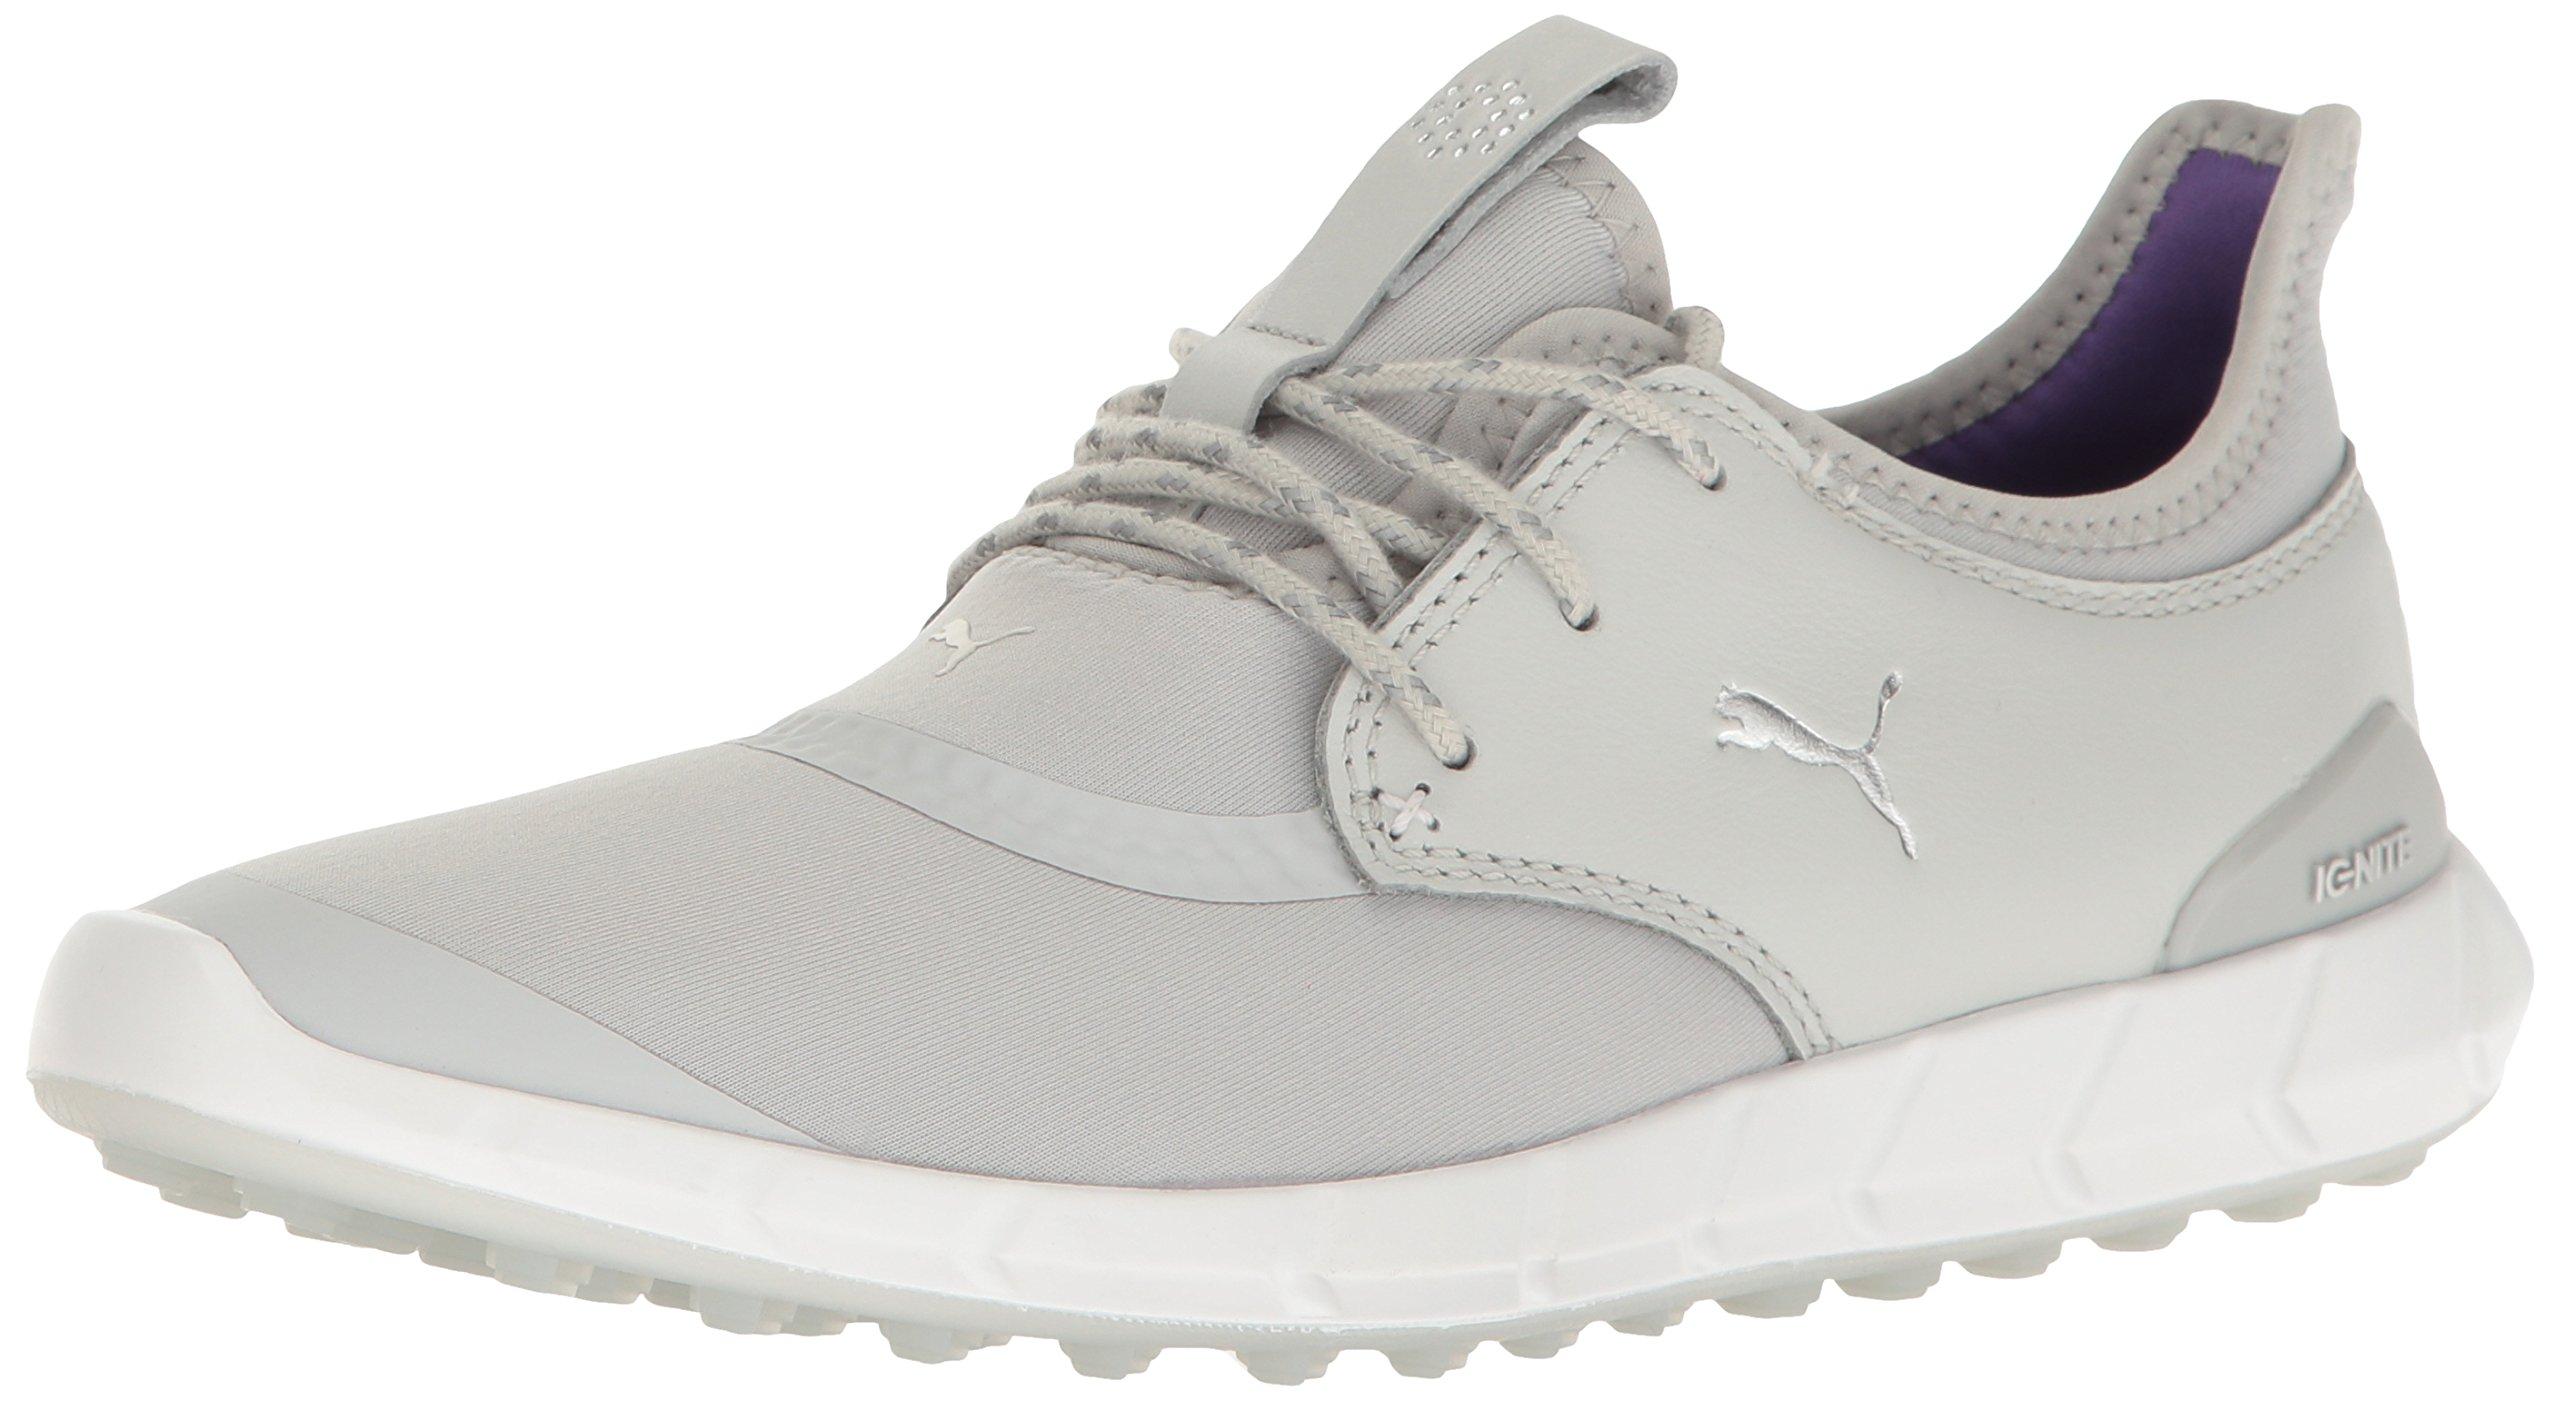 PUMA Women's Ignite Spikeless Sport WMNS Golf Shoe, Gray Violet Silver-Royal Purple, 8 Medium US by PUMA